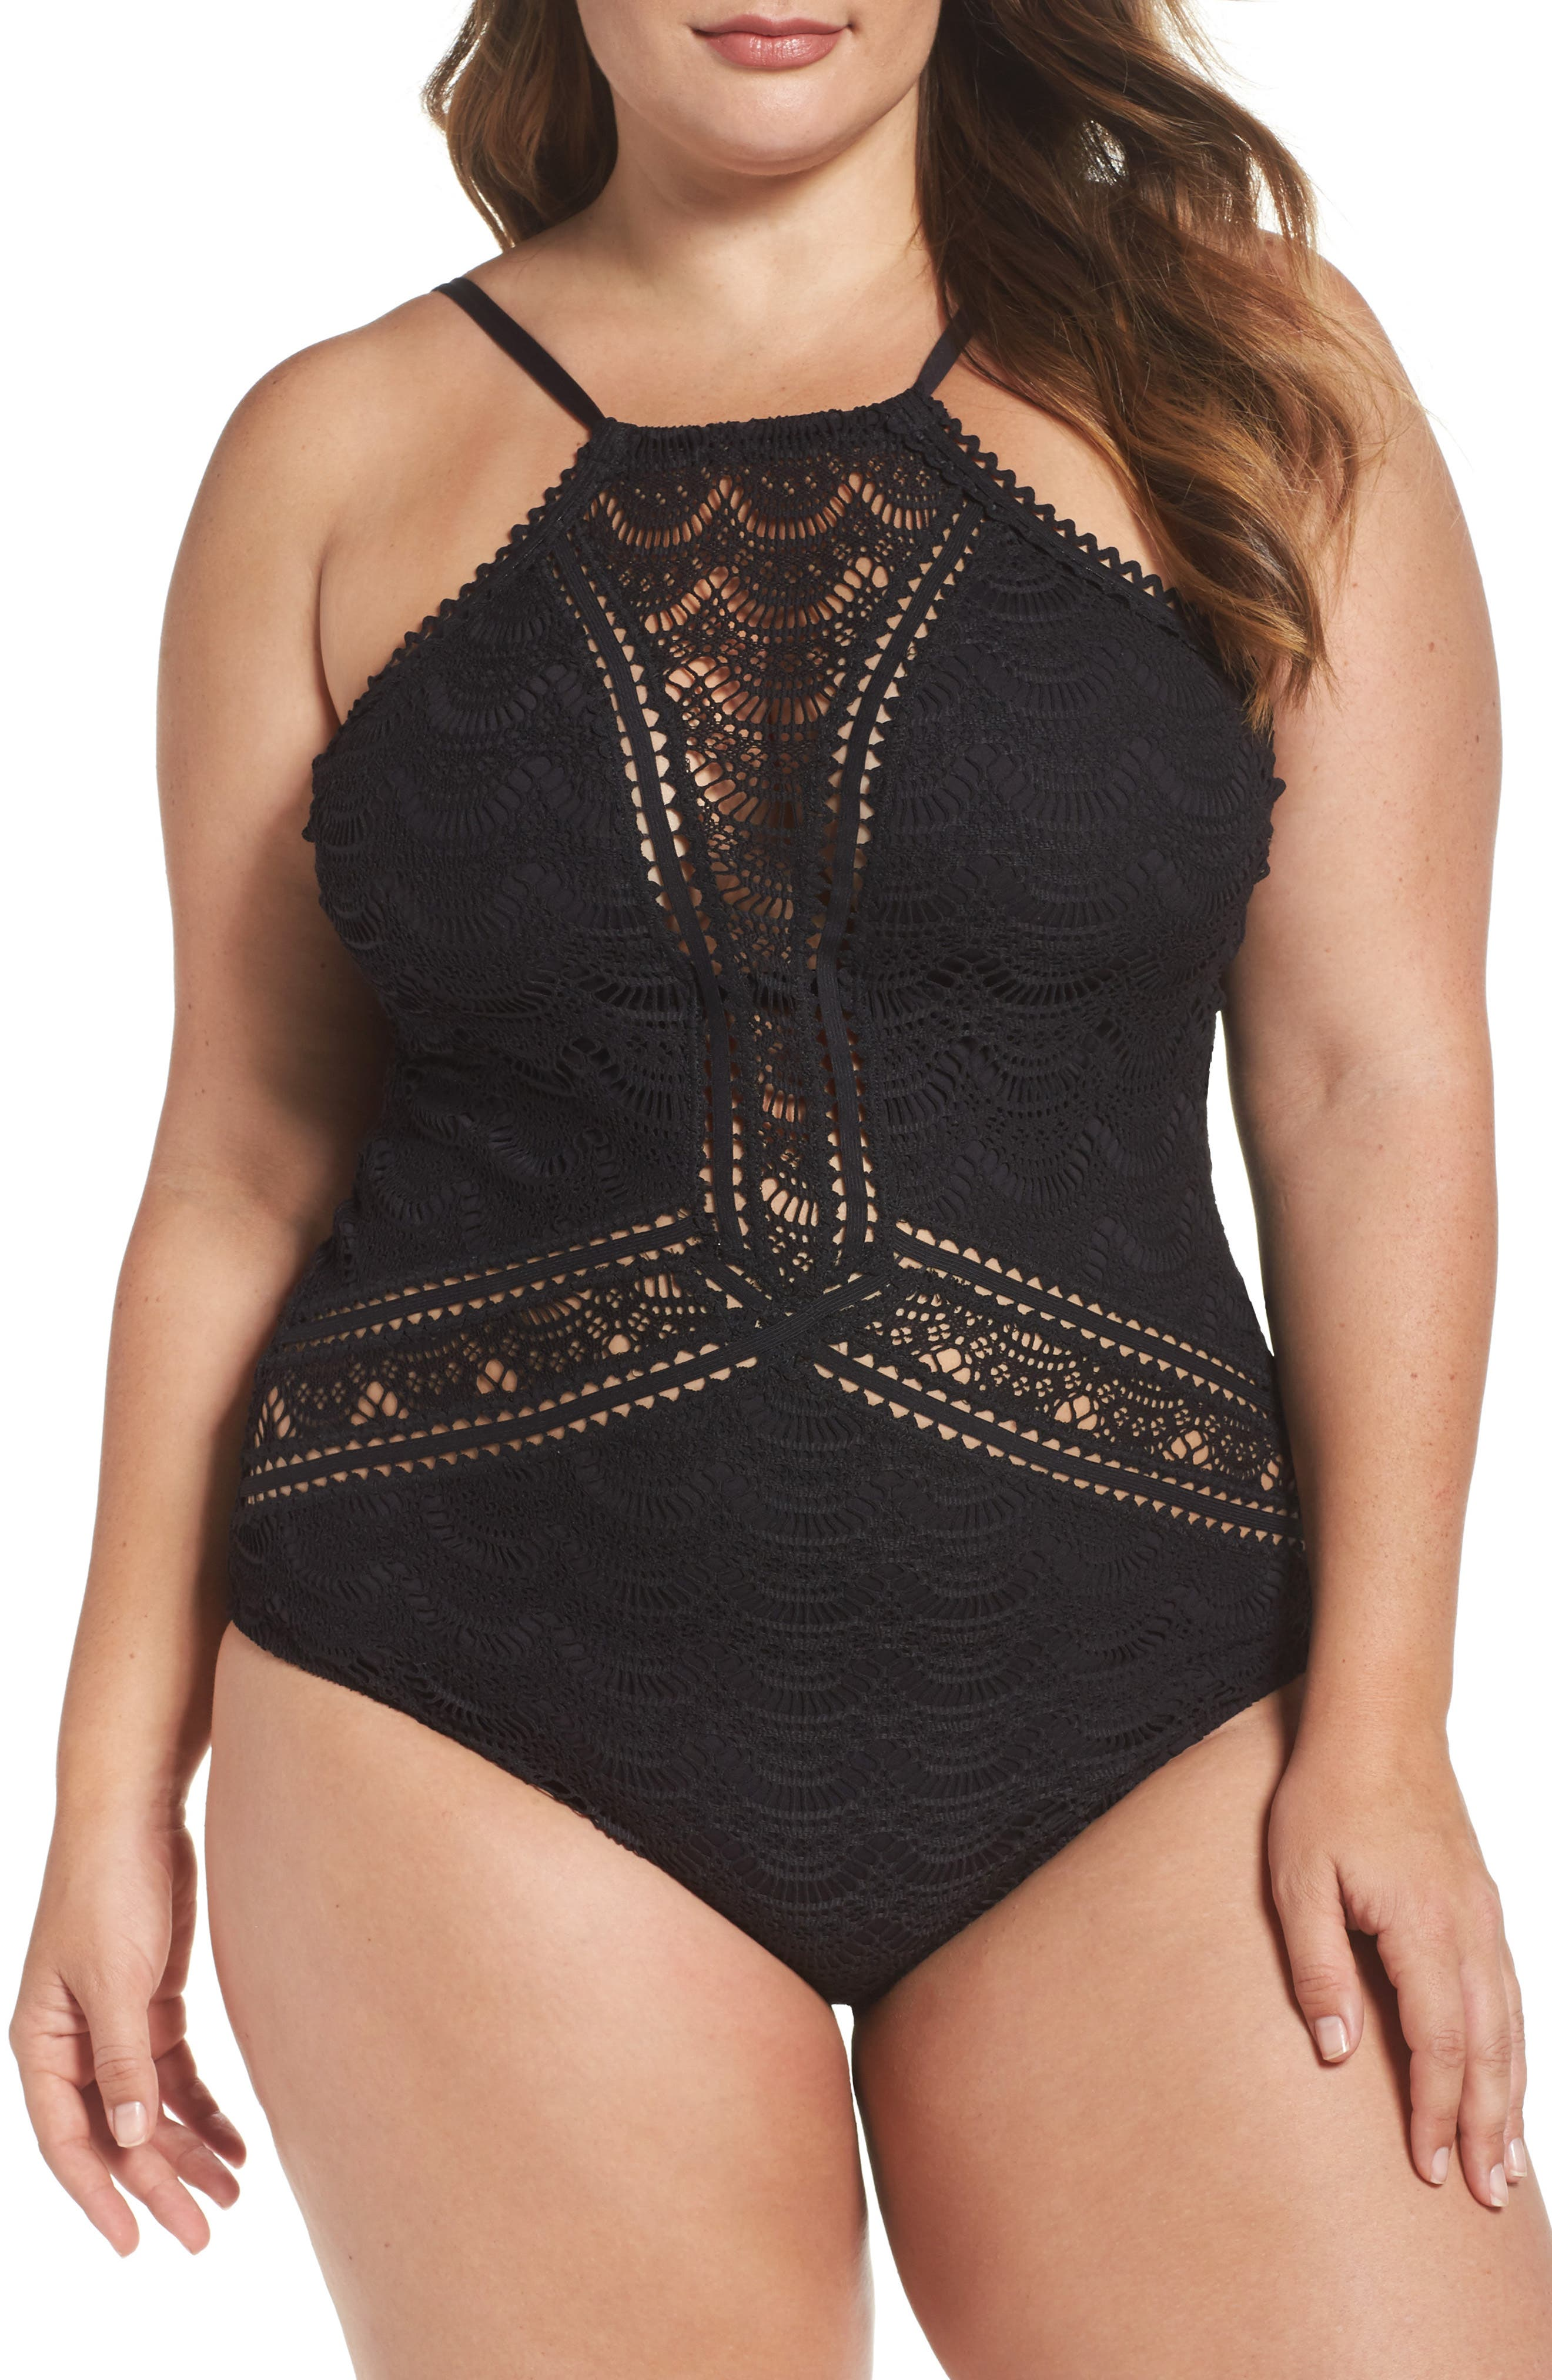 Becca Etc. One-Piece Swimsuit (Plus Size)